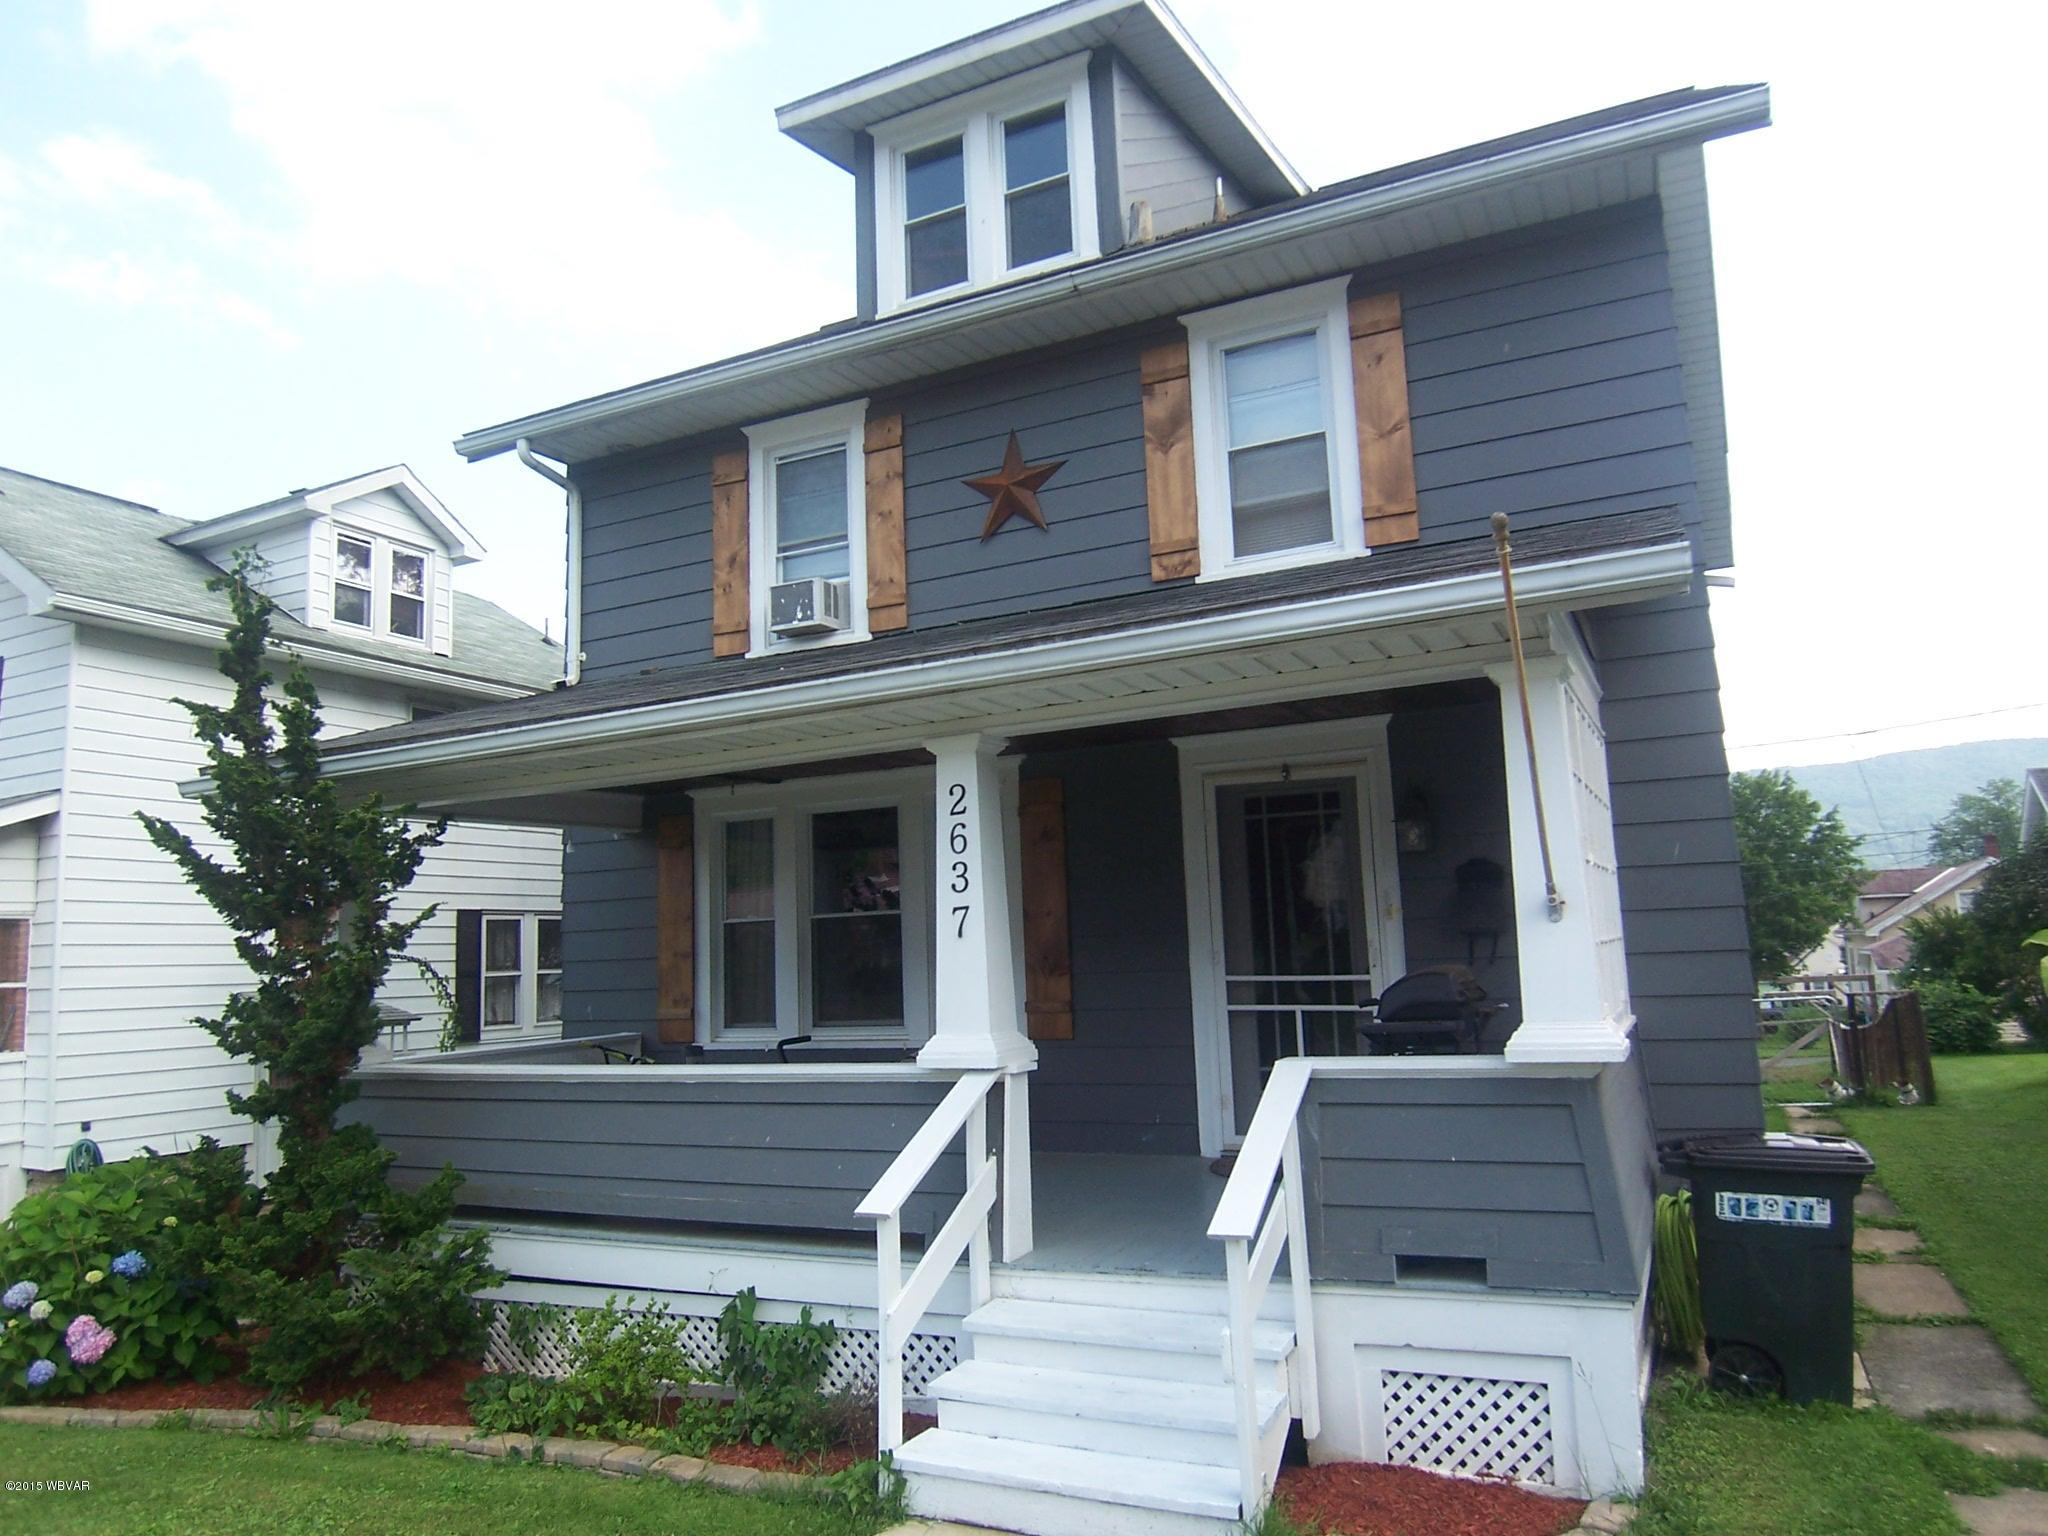 2637 NEWBERRY STREET,Williamsport,PA 17701,3 Bedrooms Bedrooms,2 BathroomsBathrooms,Residential,NEWBERRY,WB-87605